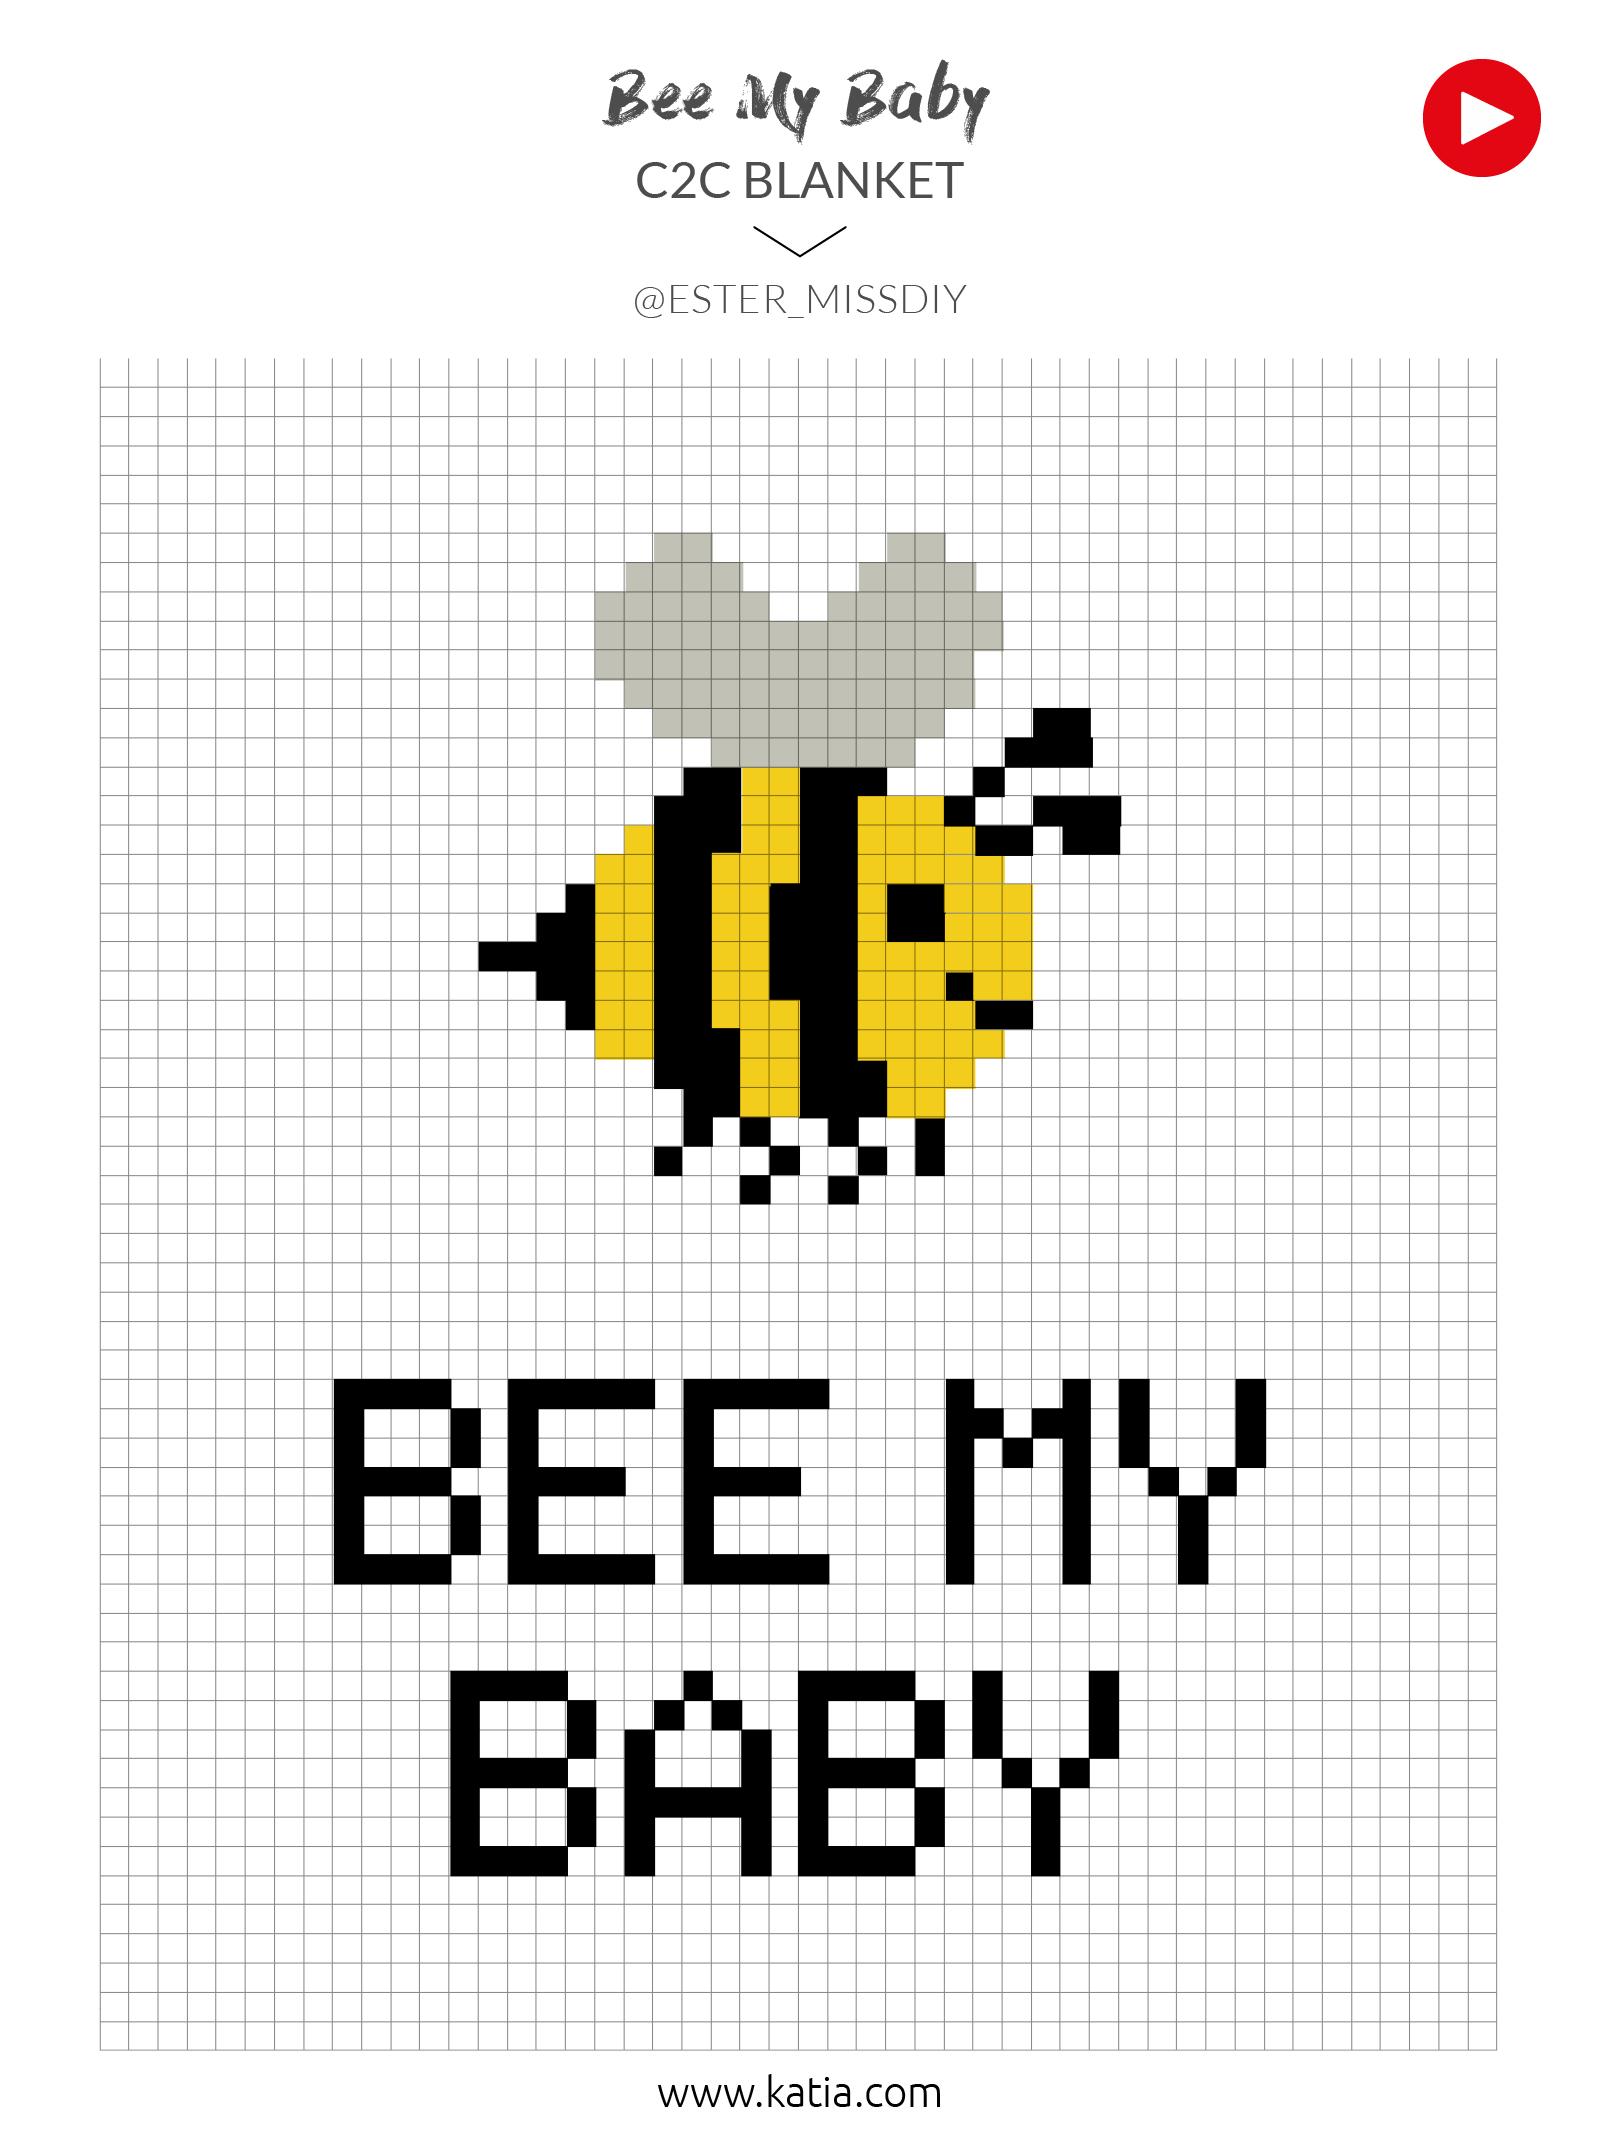 graph bee baby blanket